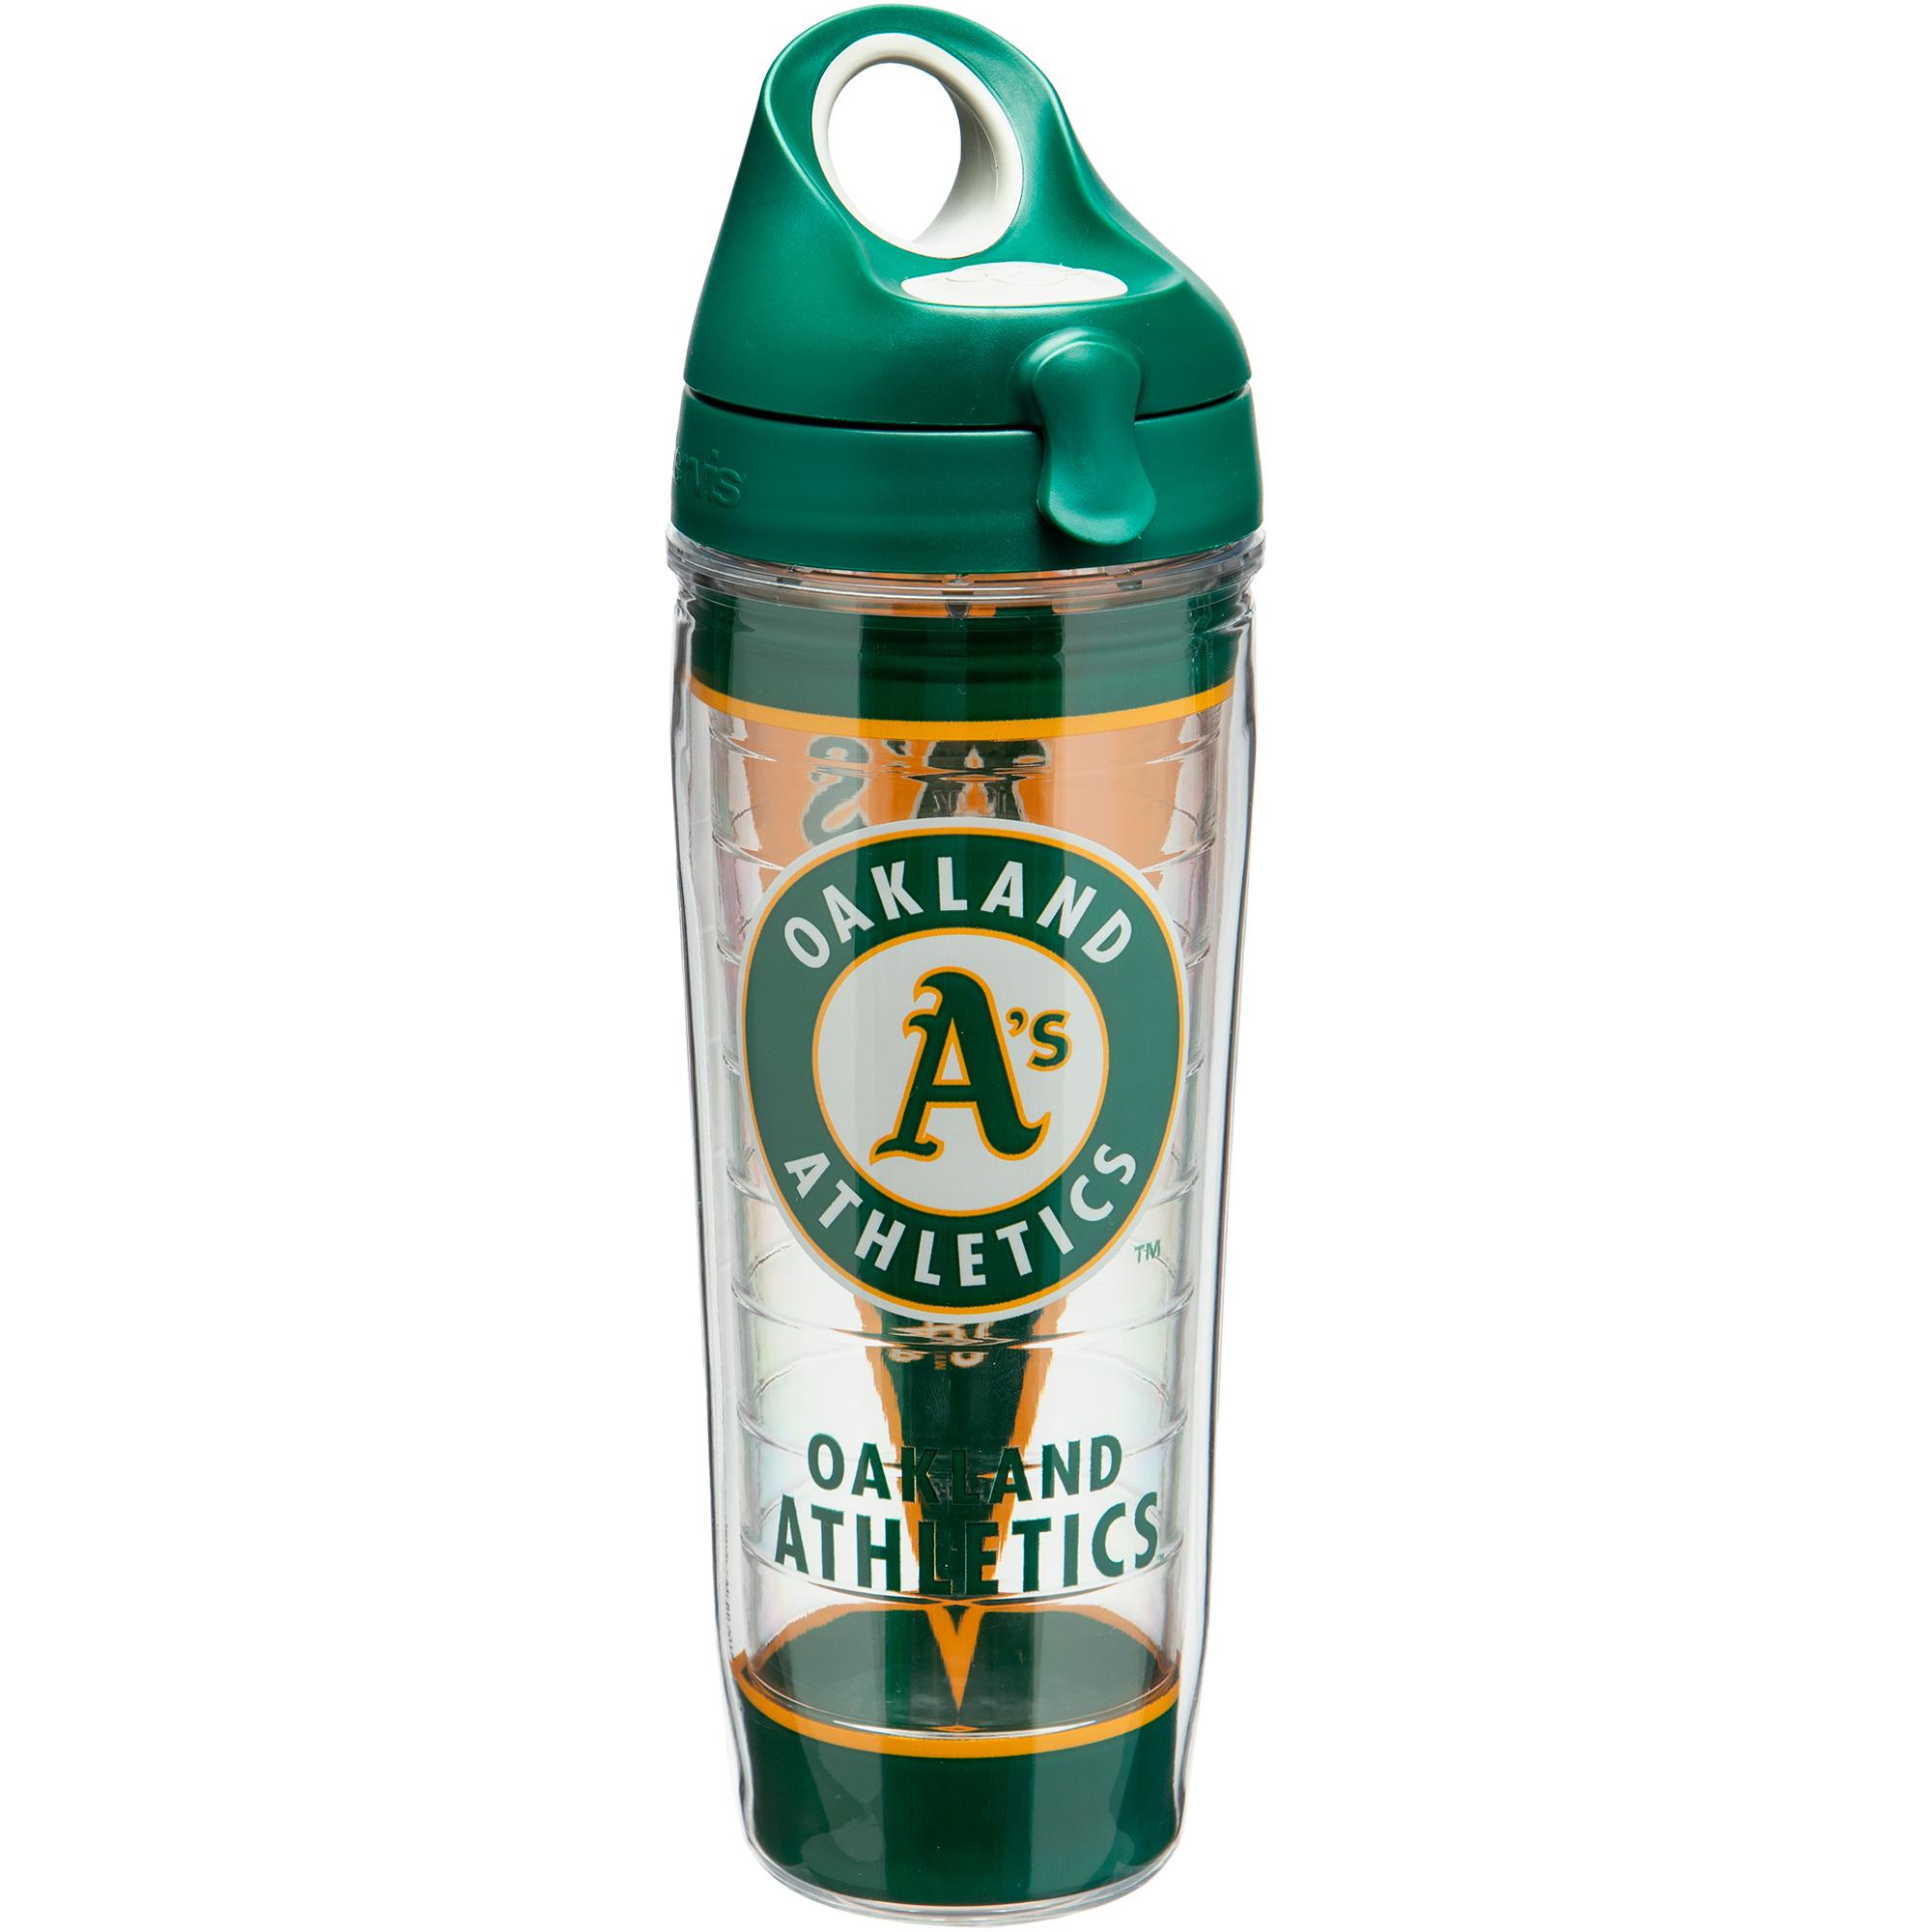 Oakland Athletics Tervis 24oz. Acrylic Water Bottle - No Size